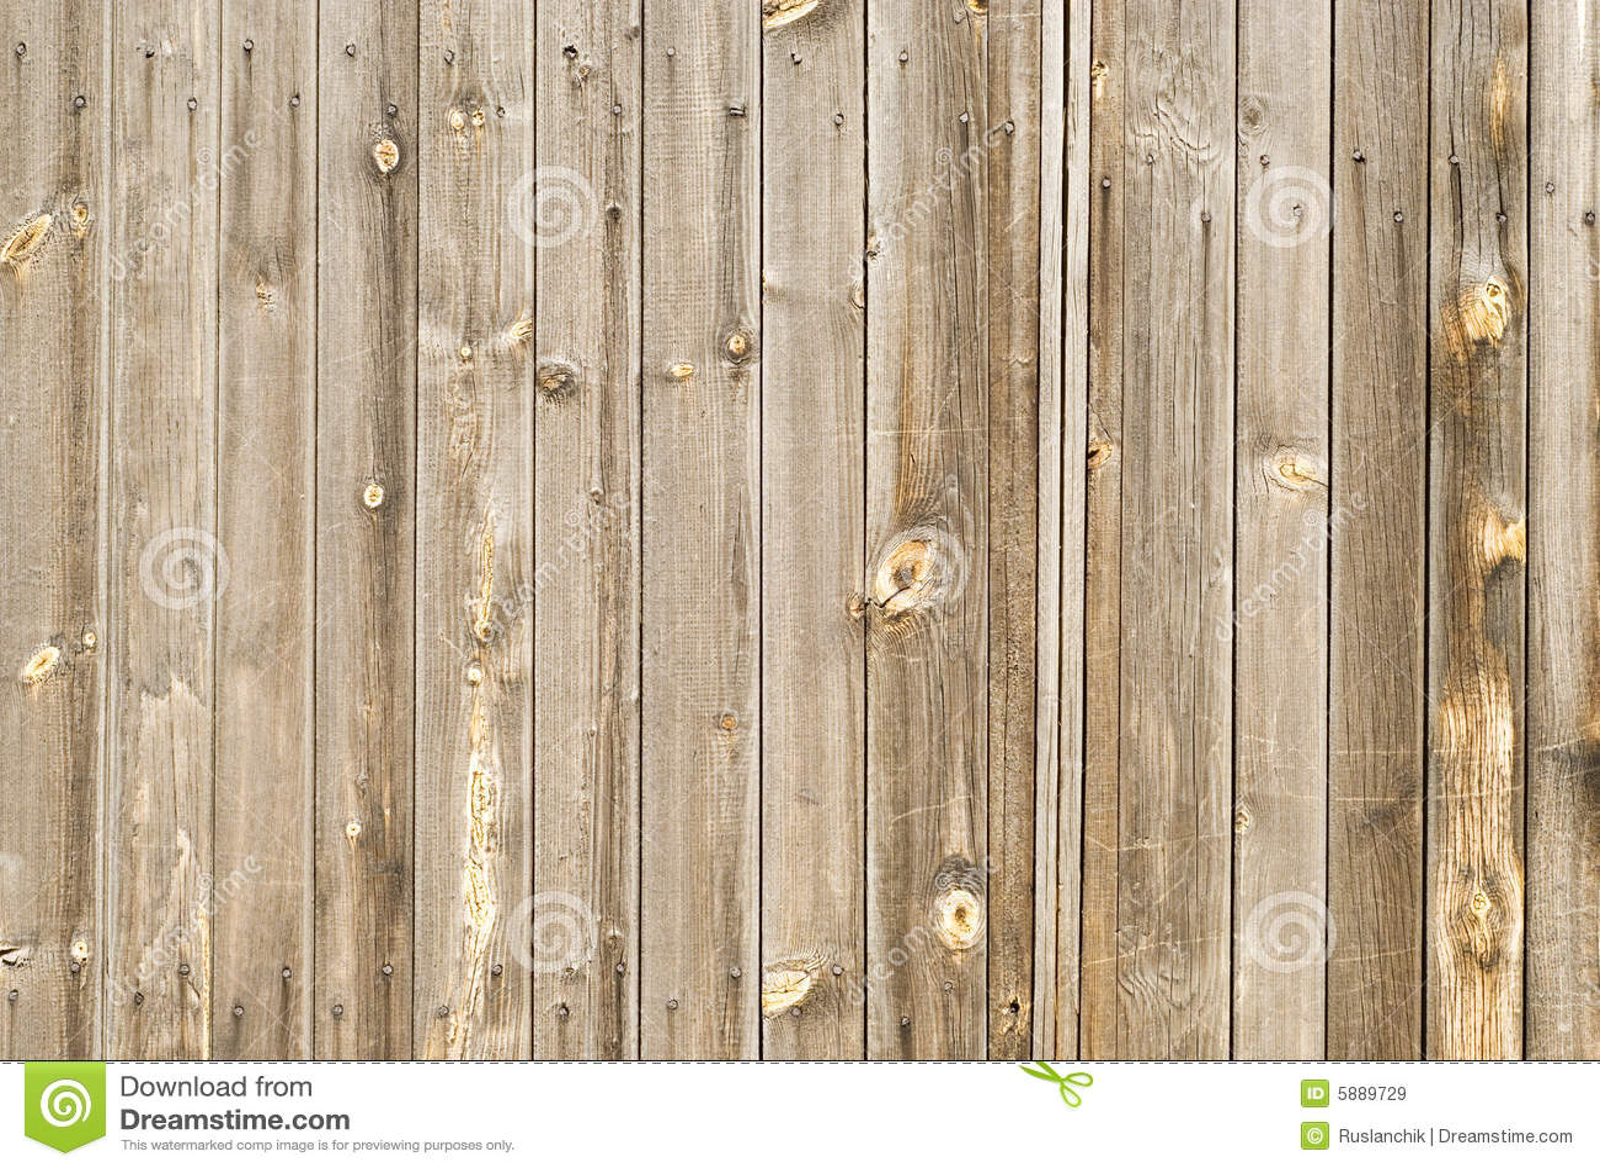 Wood Panel Background Royalty Free Stock Images Image